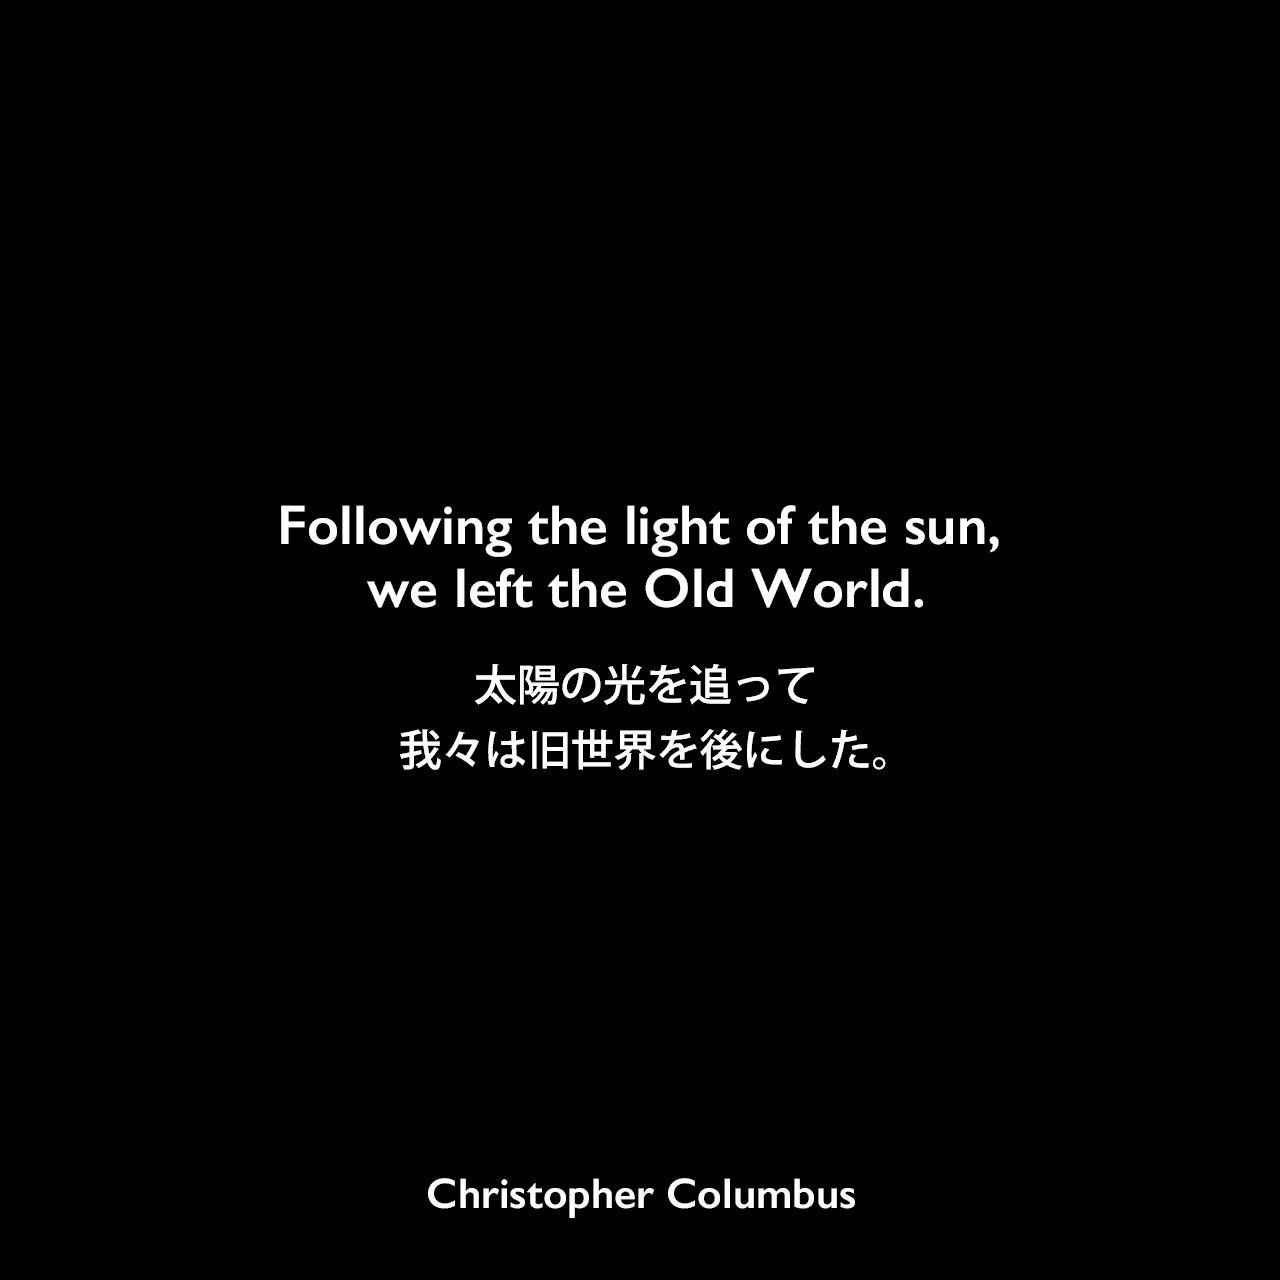 Following the light of the sun, we left the Old World.太陽の光を追って我々は旧世界を後にした。Christopher Columbus